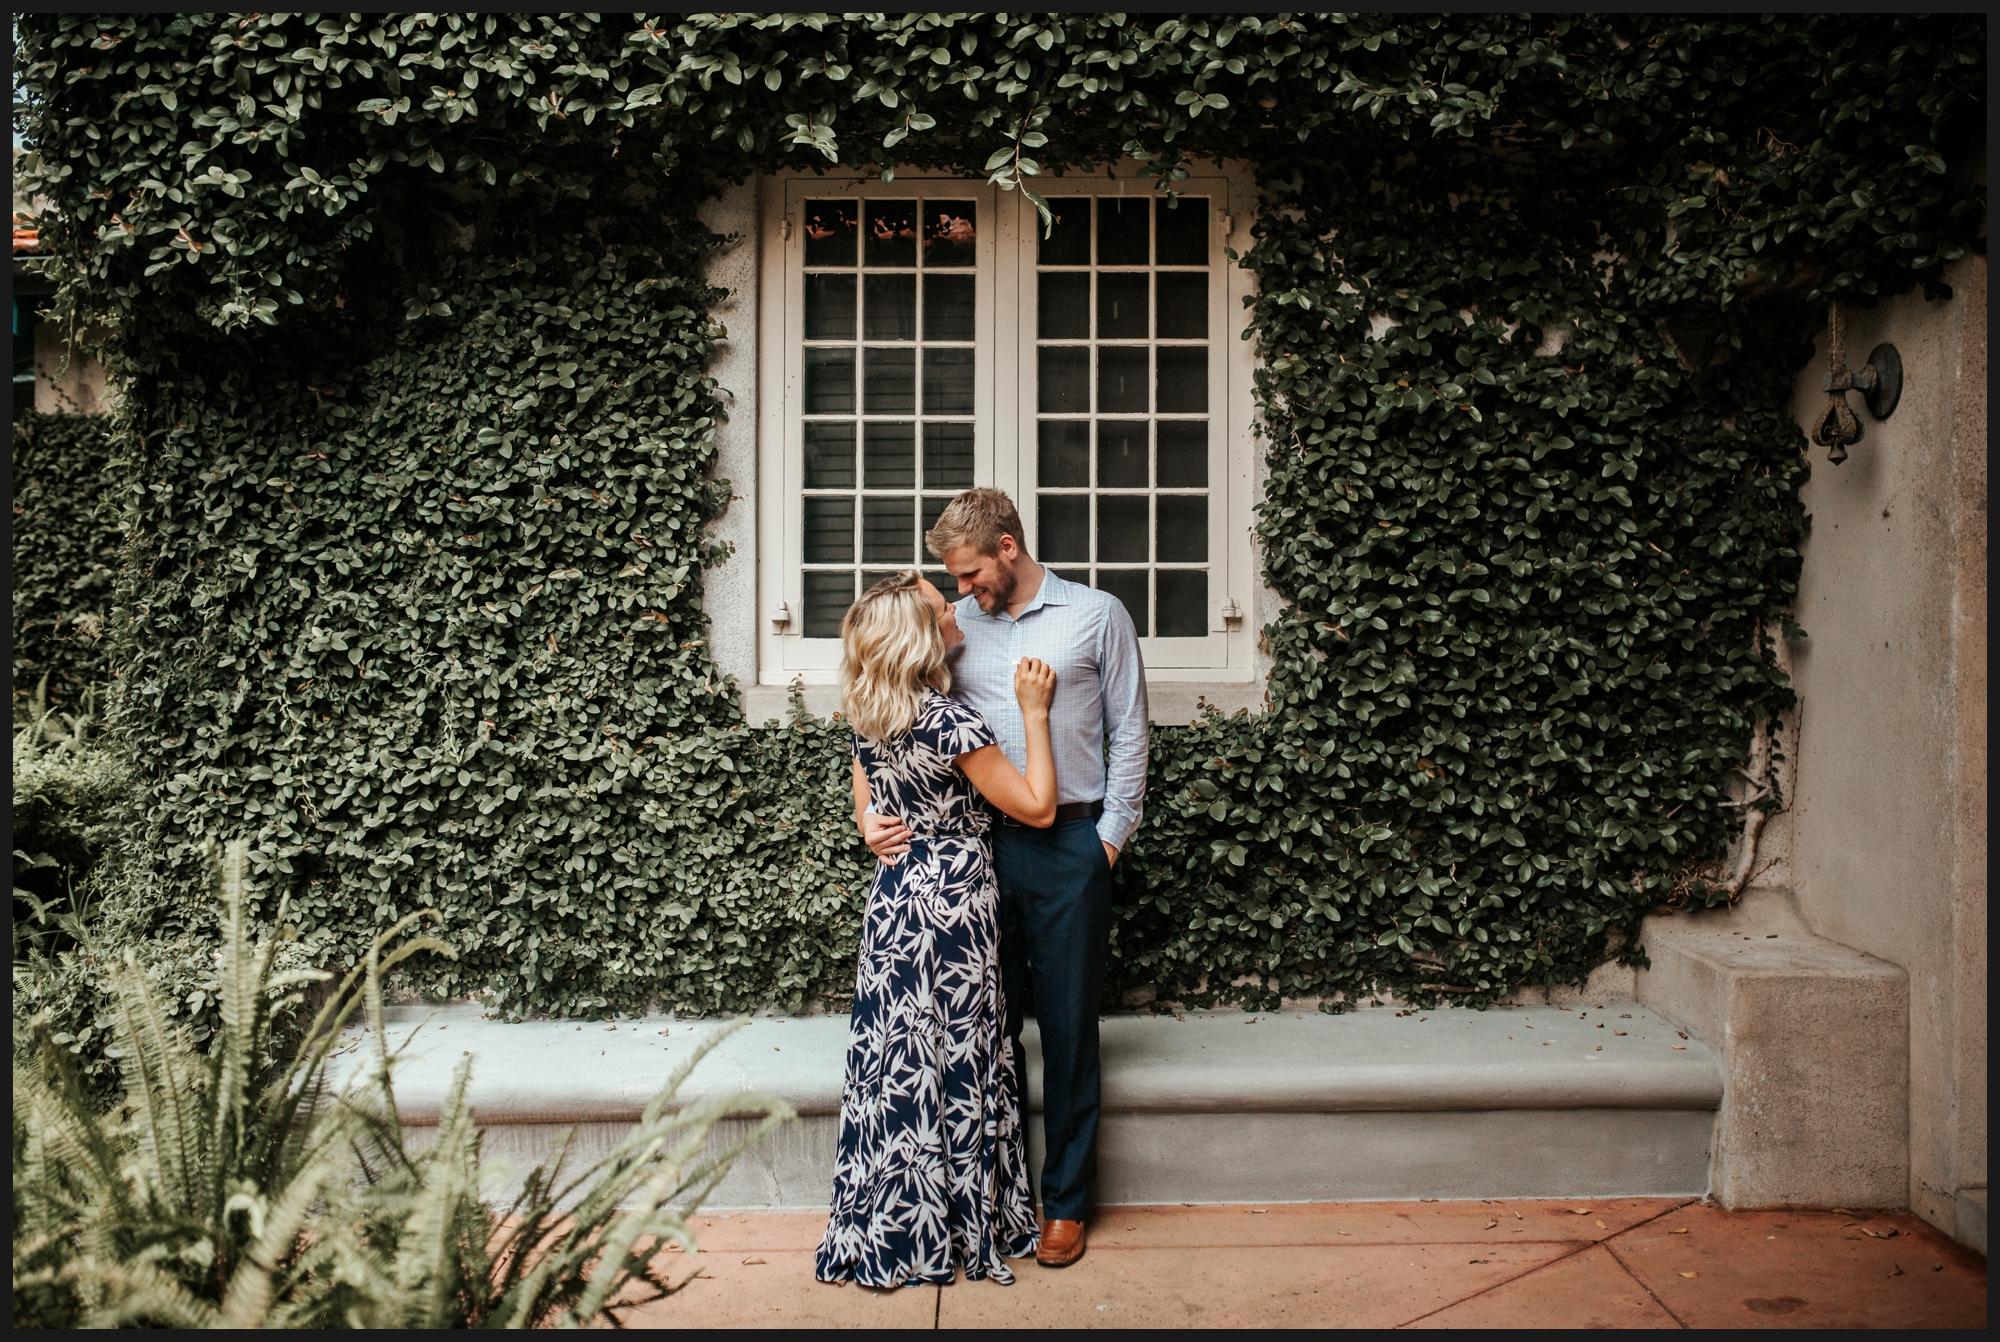 Orlando-Wedding-Photographer-destination-wedding-photographer-florida-wedding-photographer-bohemian-wedding-photographer_0193.jpg